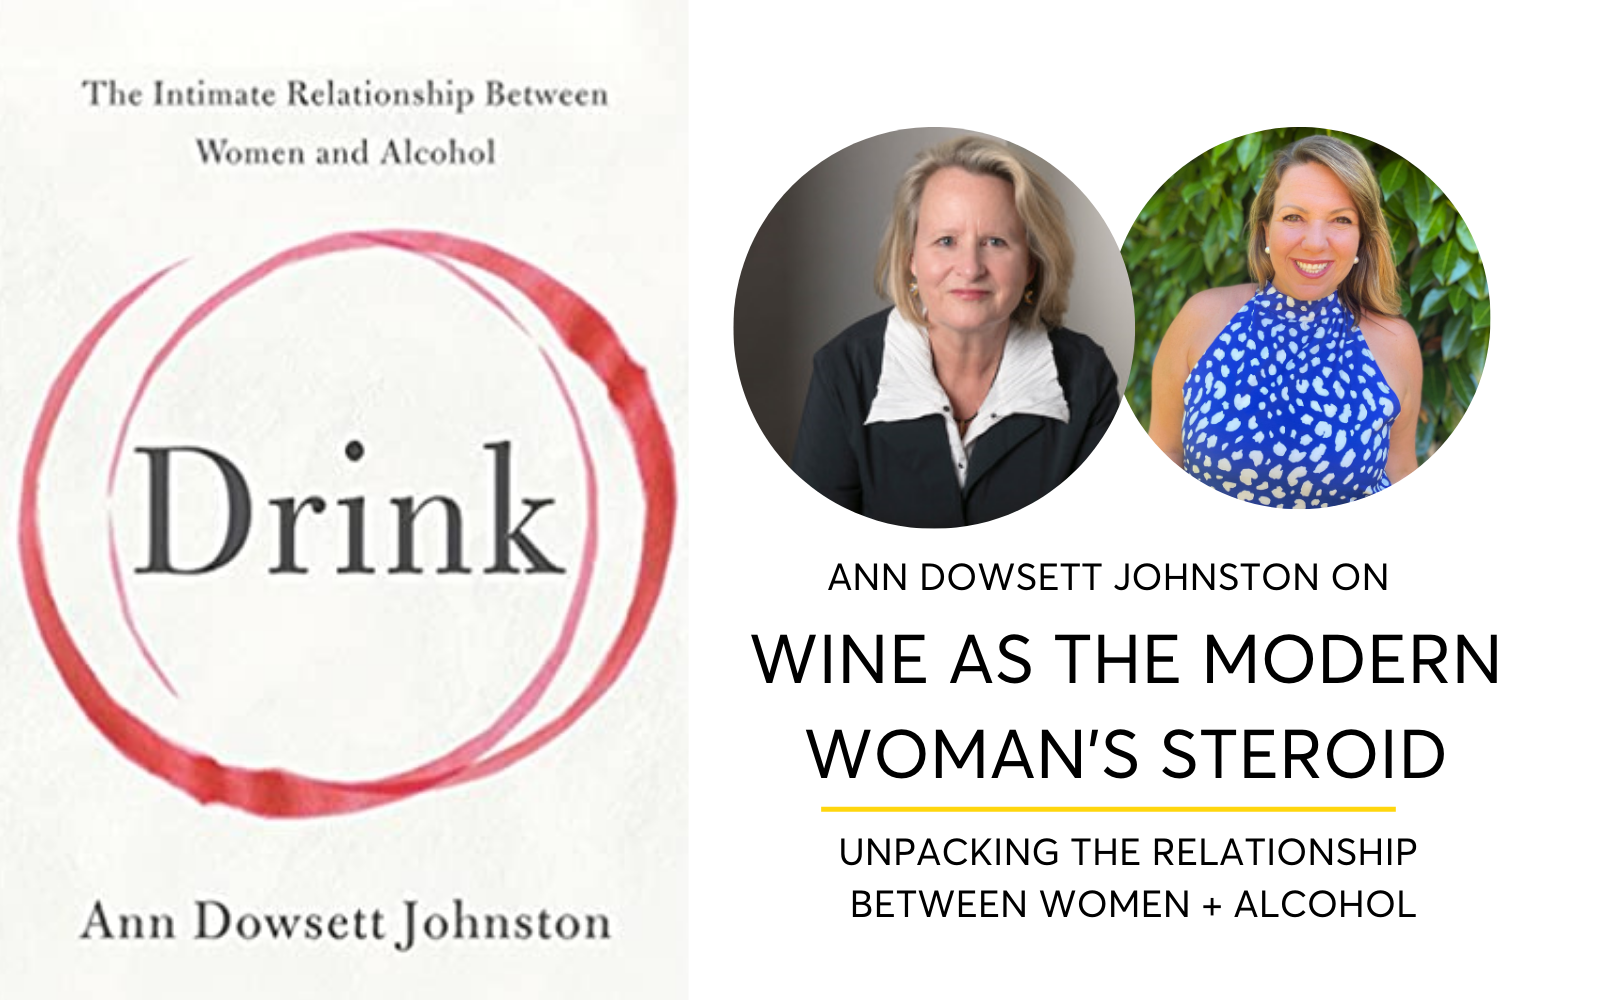 Ann Dowsett Johnston On Wine As The Modern Woman's Steroid